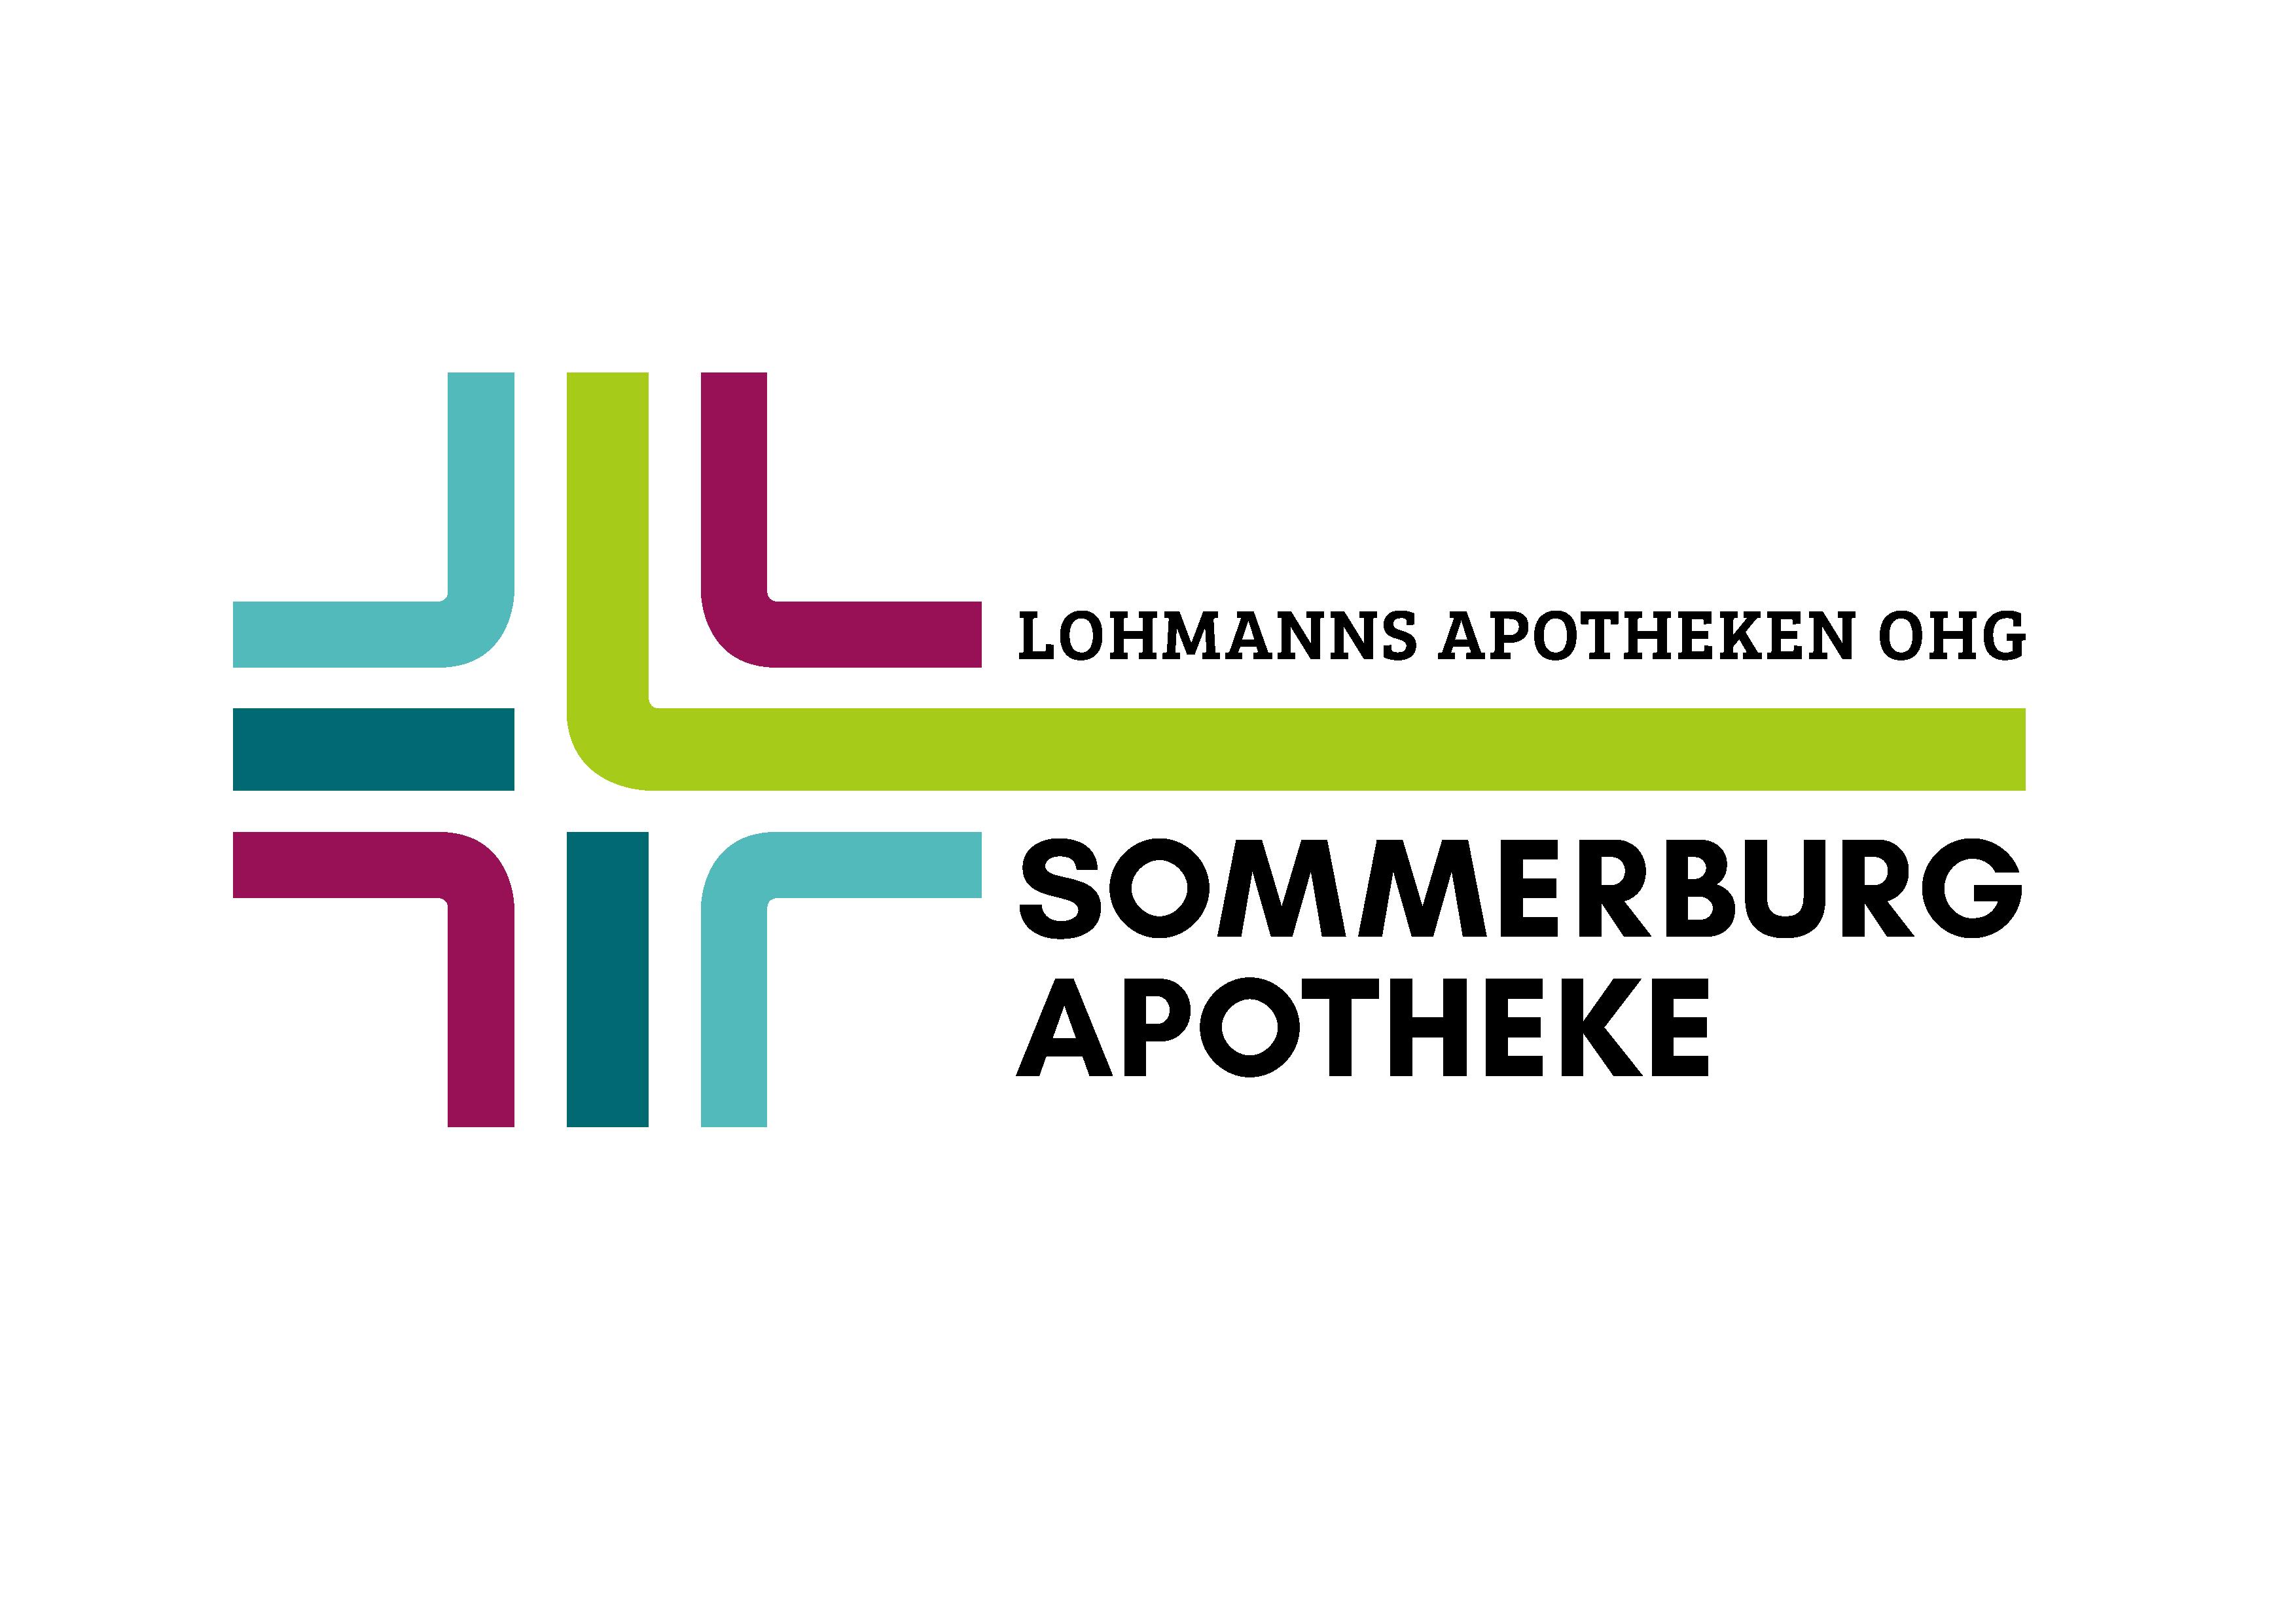 Logo der Sommerburg-Apotheke, Lohmanns Apotheken OHG